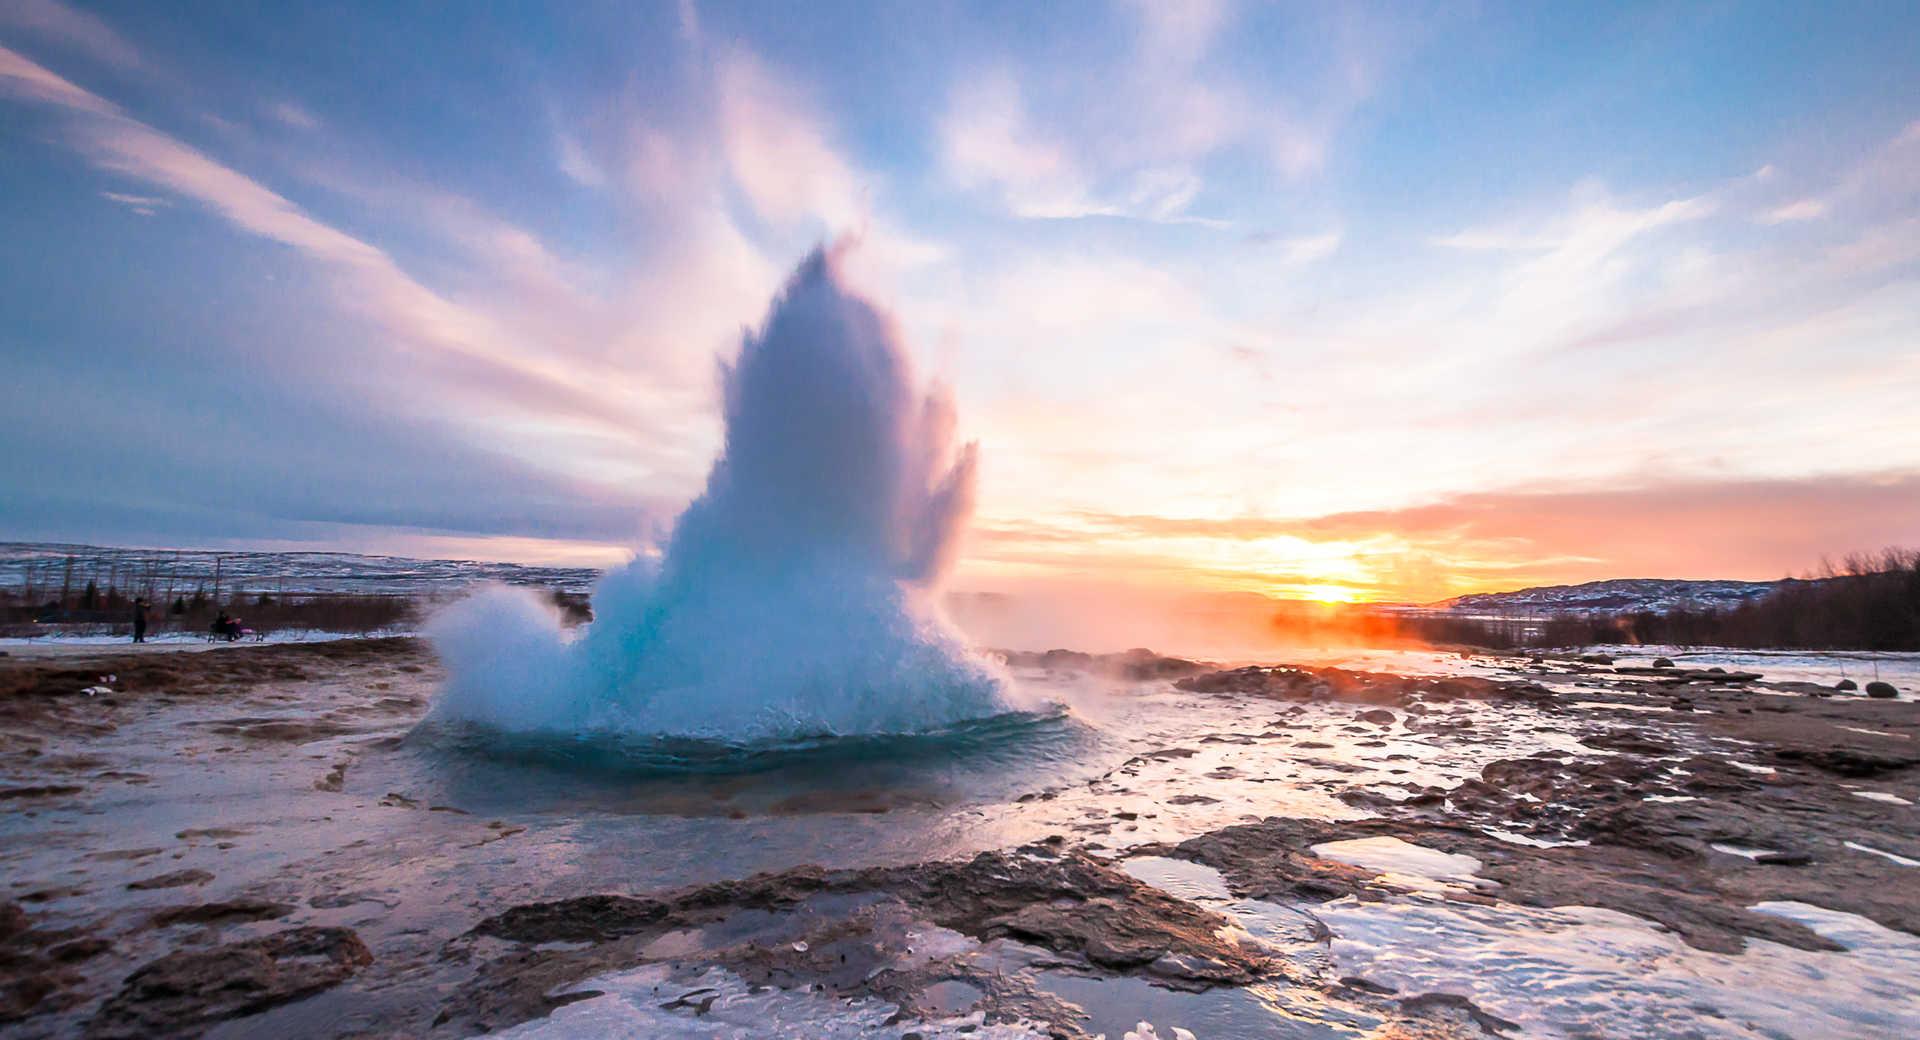 Explosion du geyser Strokkur sur le cercle d'or en Islande